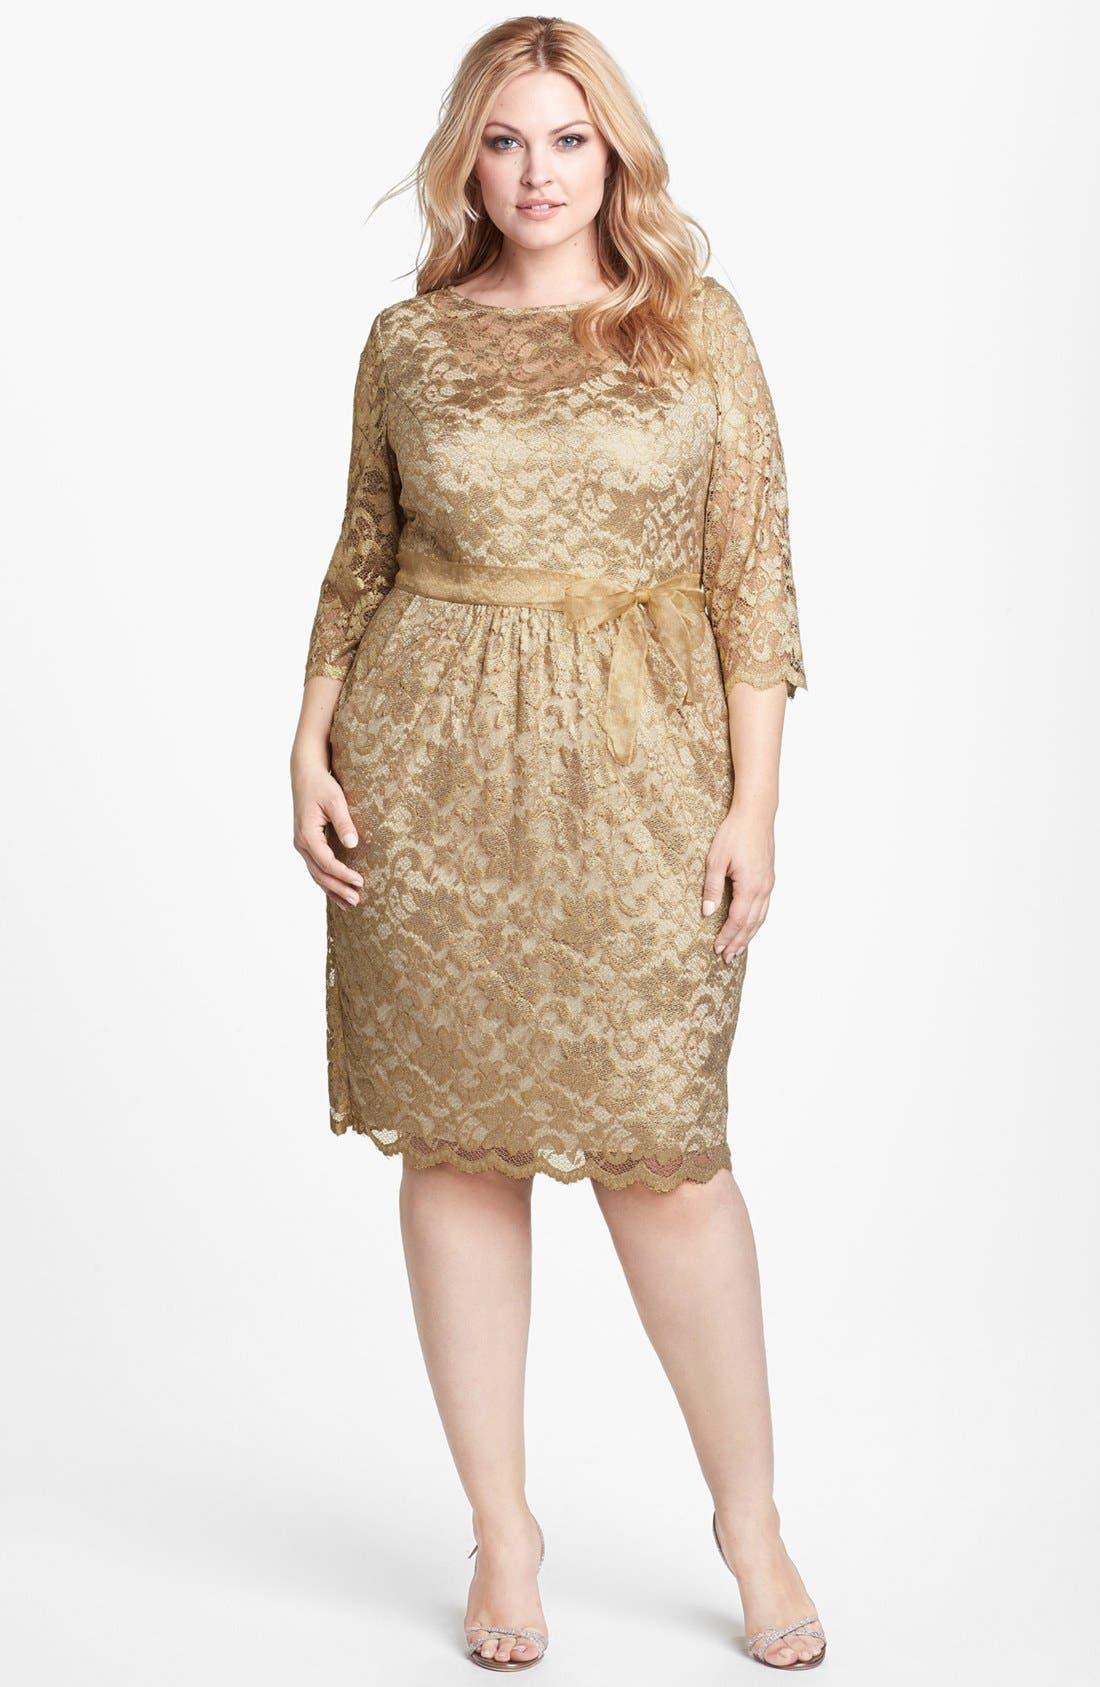 Alternate Image 1 Selected - Alex Evenings Metallic Lace Dress (Plus Size)